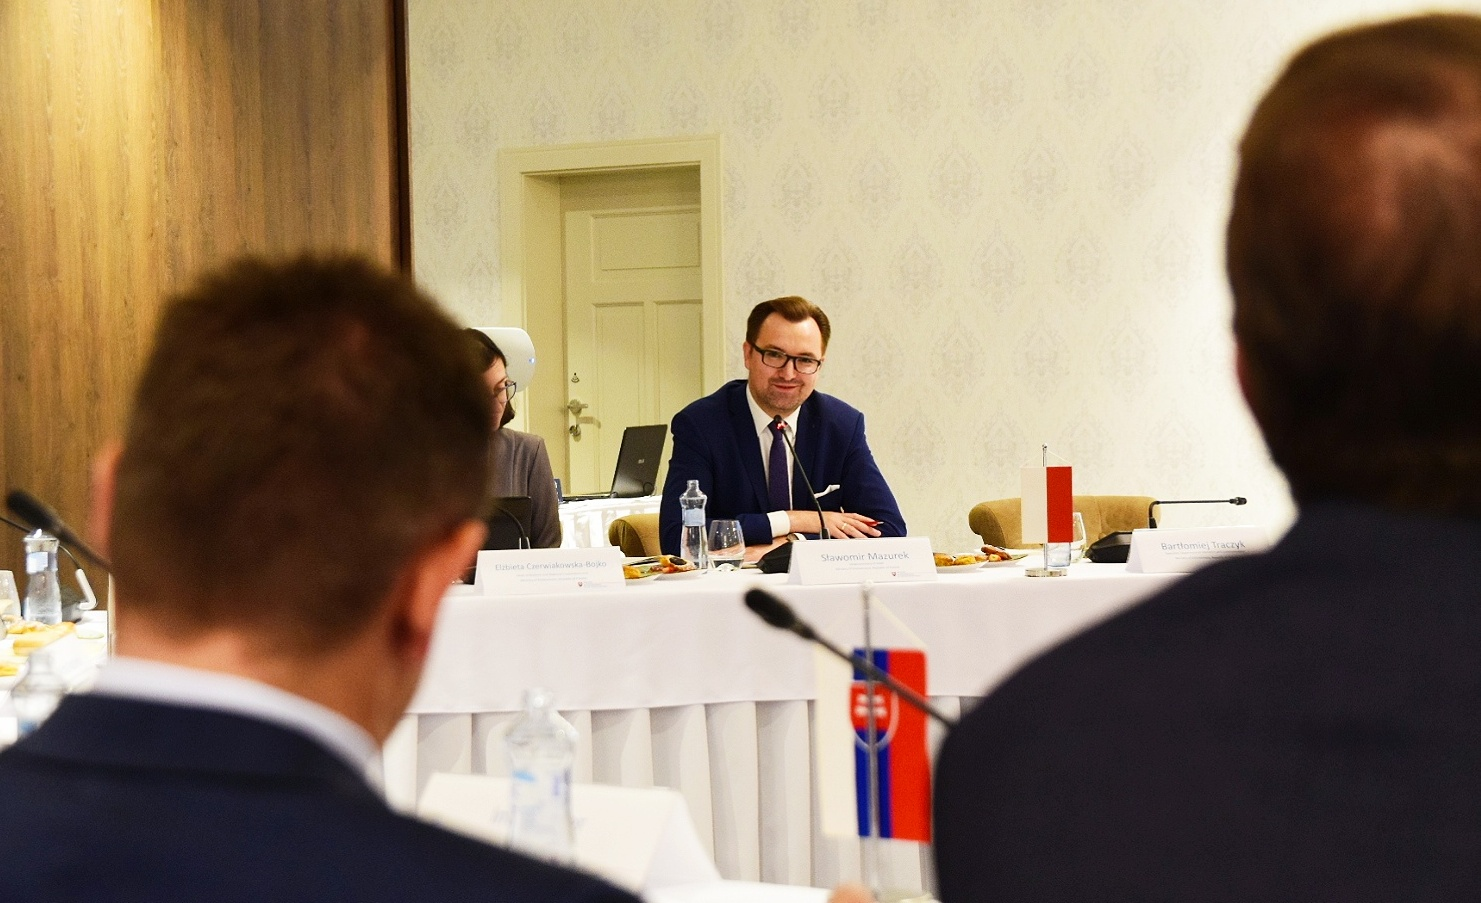 wiceminister Sławomir Mazurek